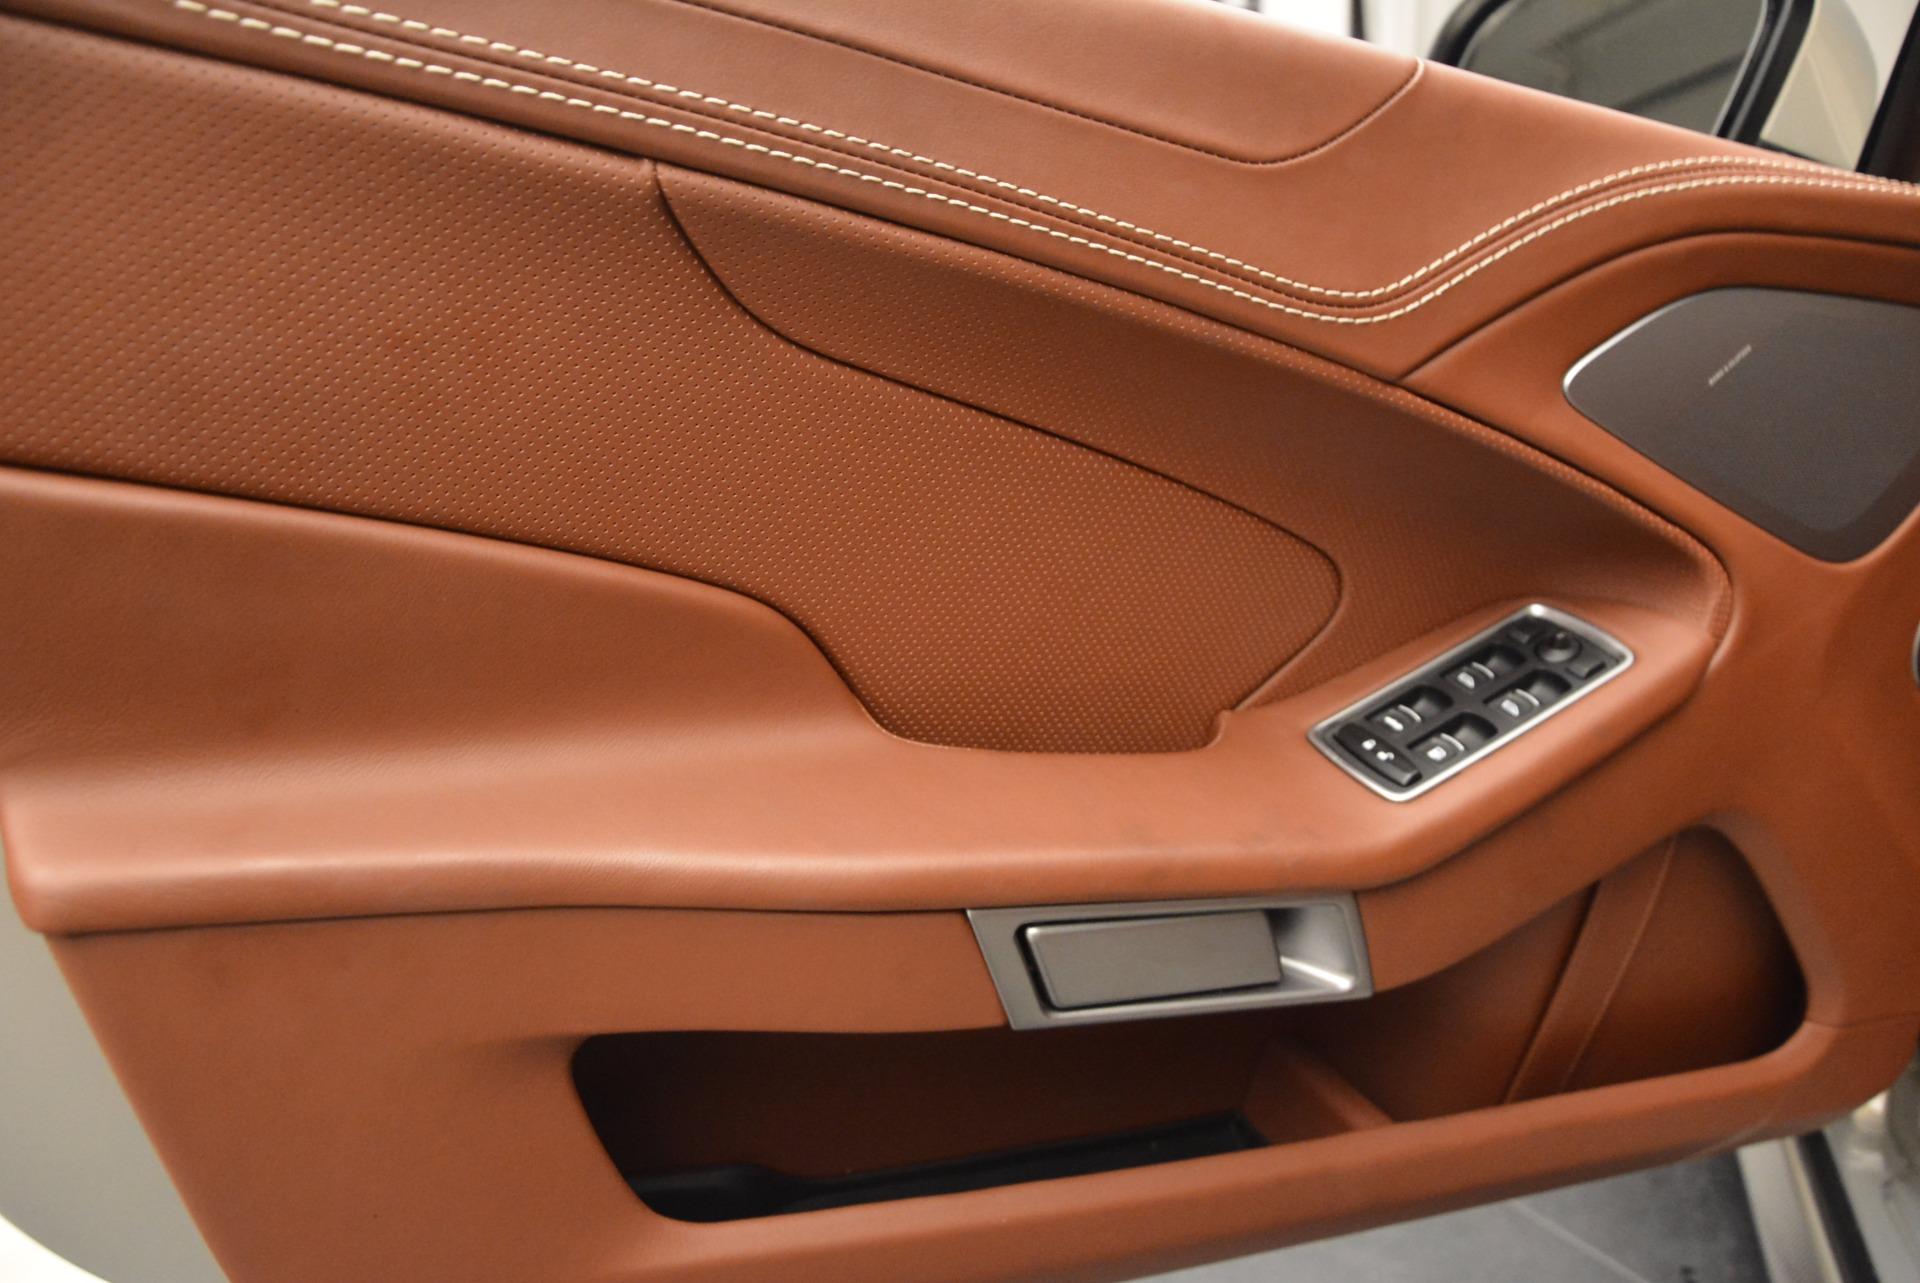 Used 2015 Aston Martin Vanquish Volante For Sale In Greenwich, CT 1448_p22